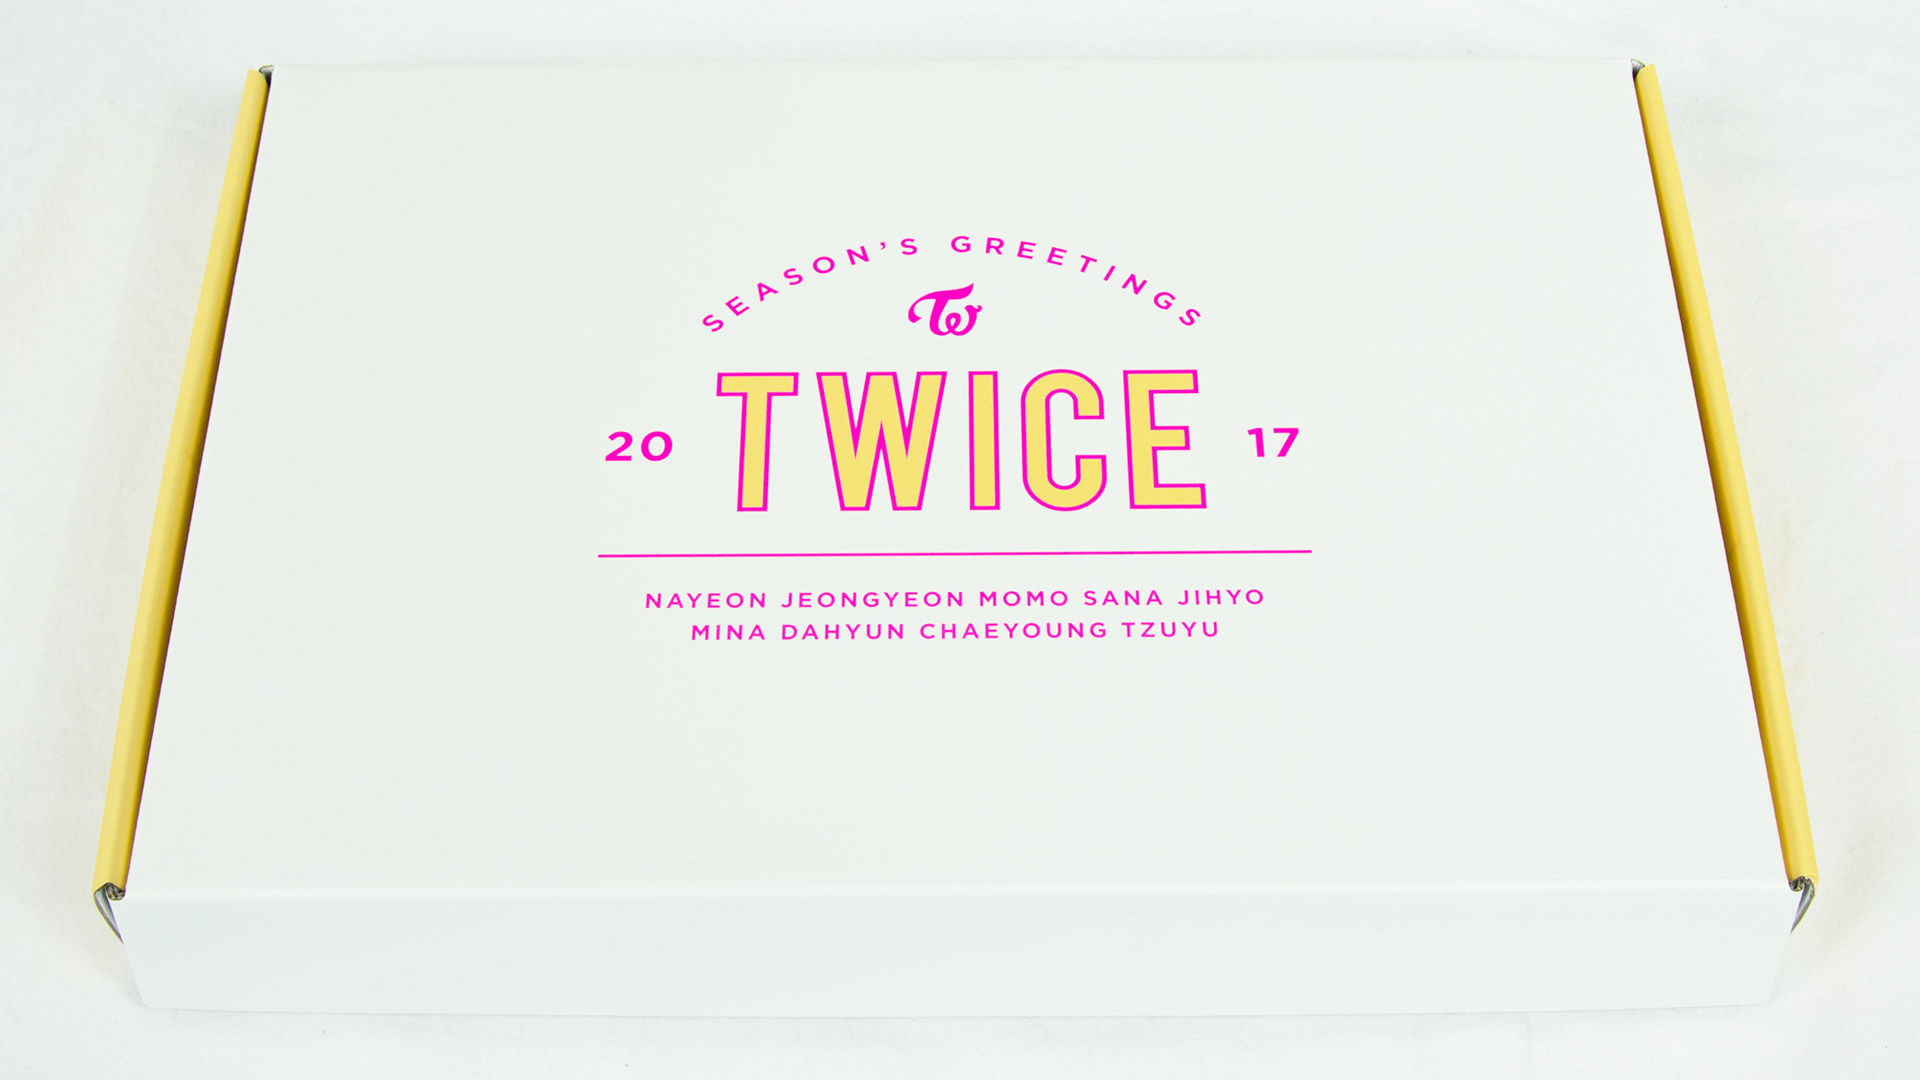 Twice - Season's Greeting 2017